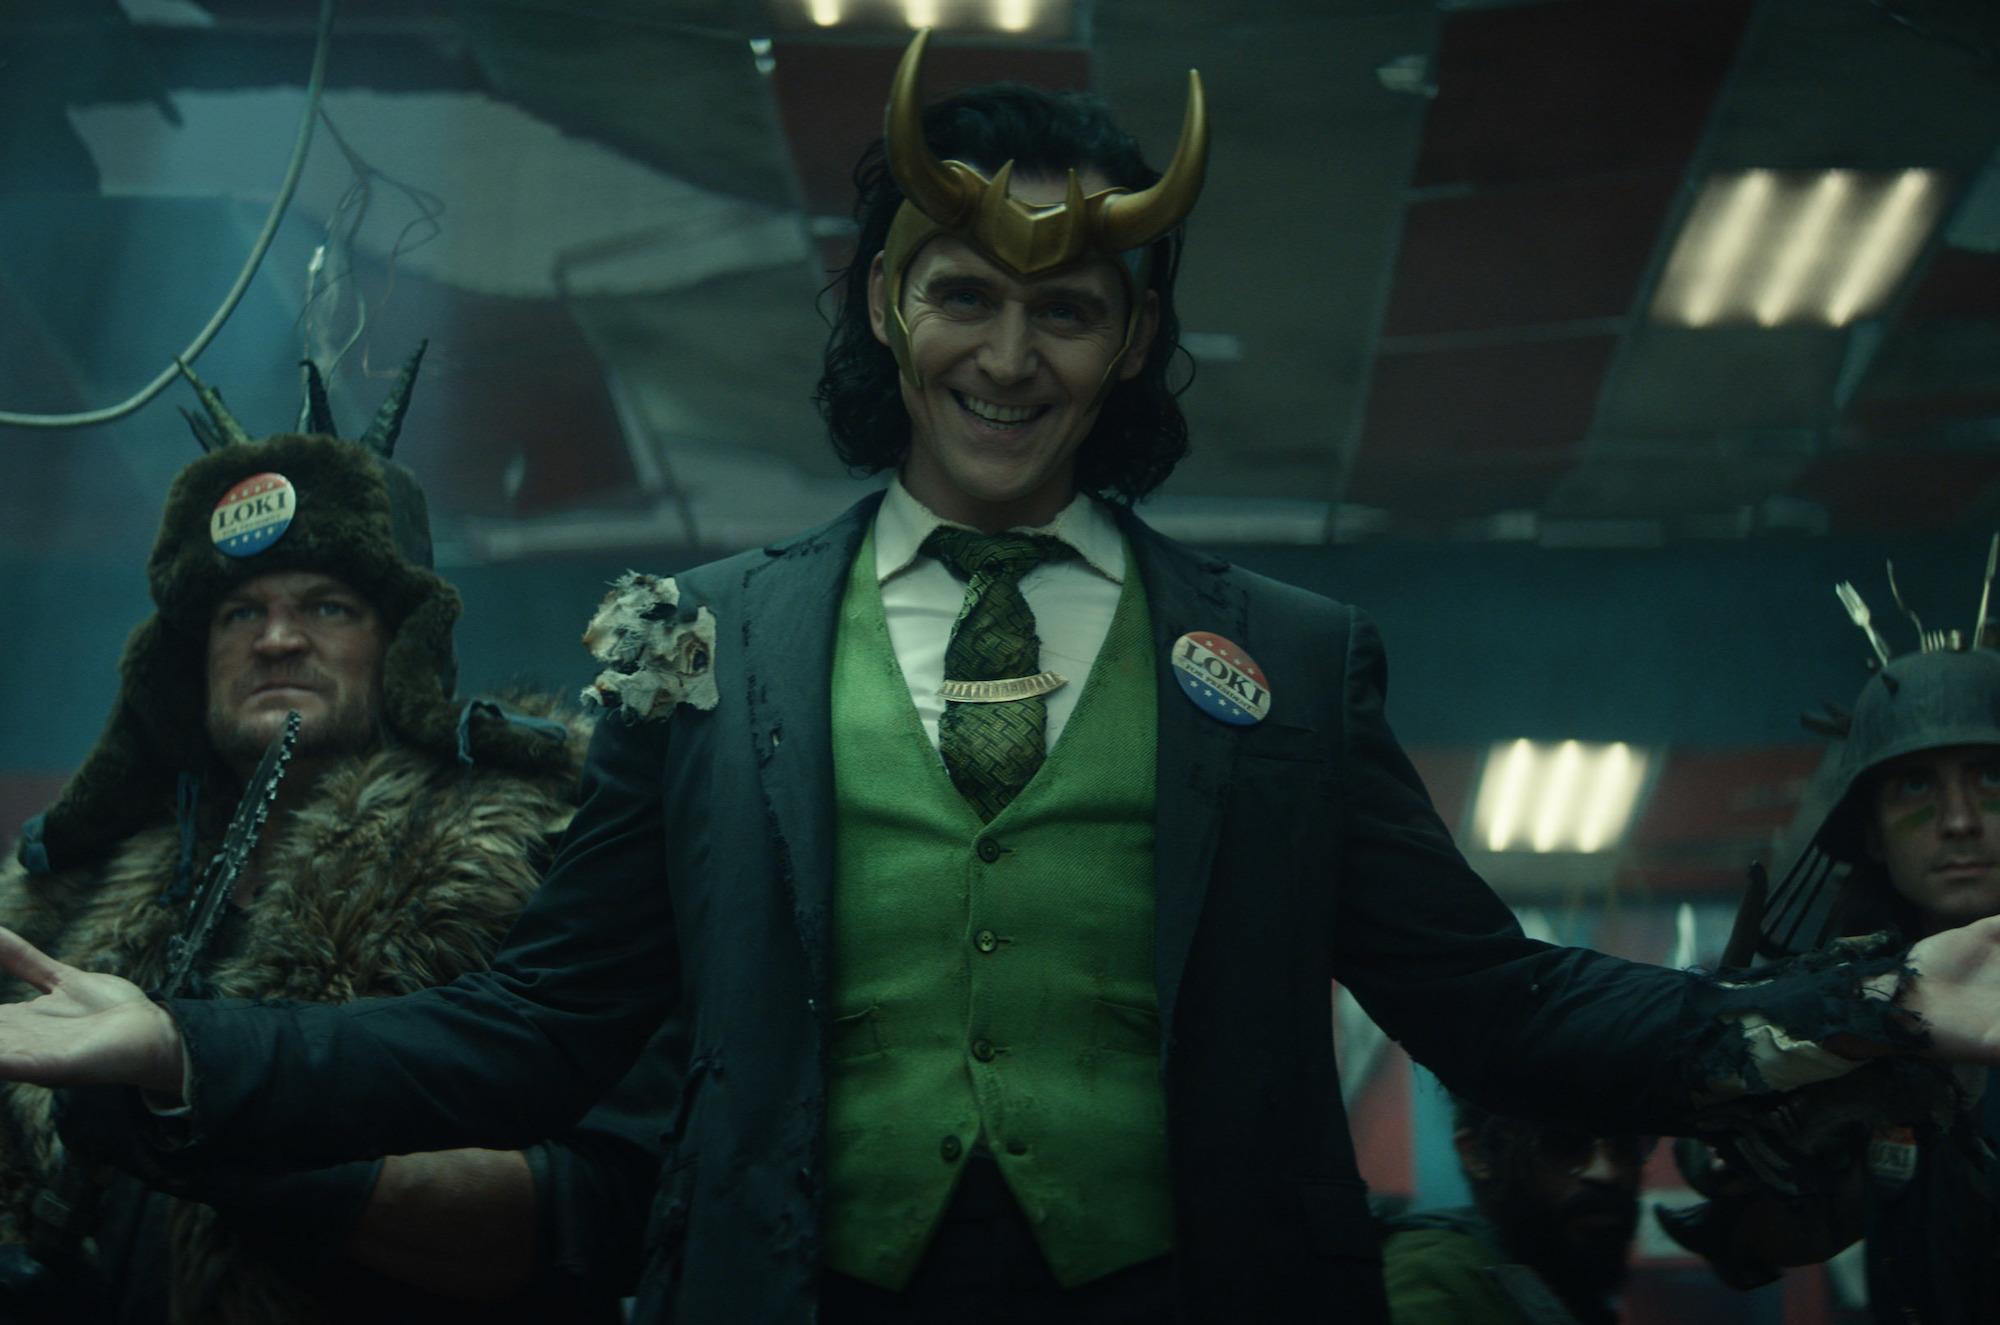 Tom Hiddleston as Loki in 'Loki' the Disney+ series